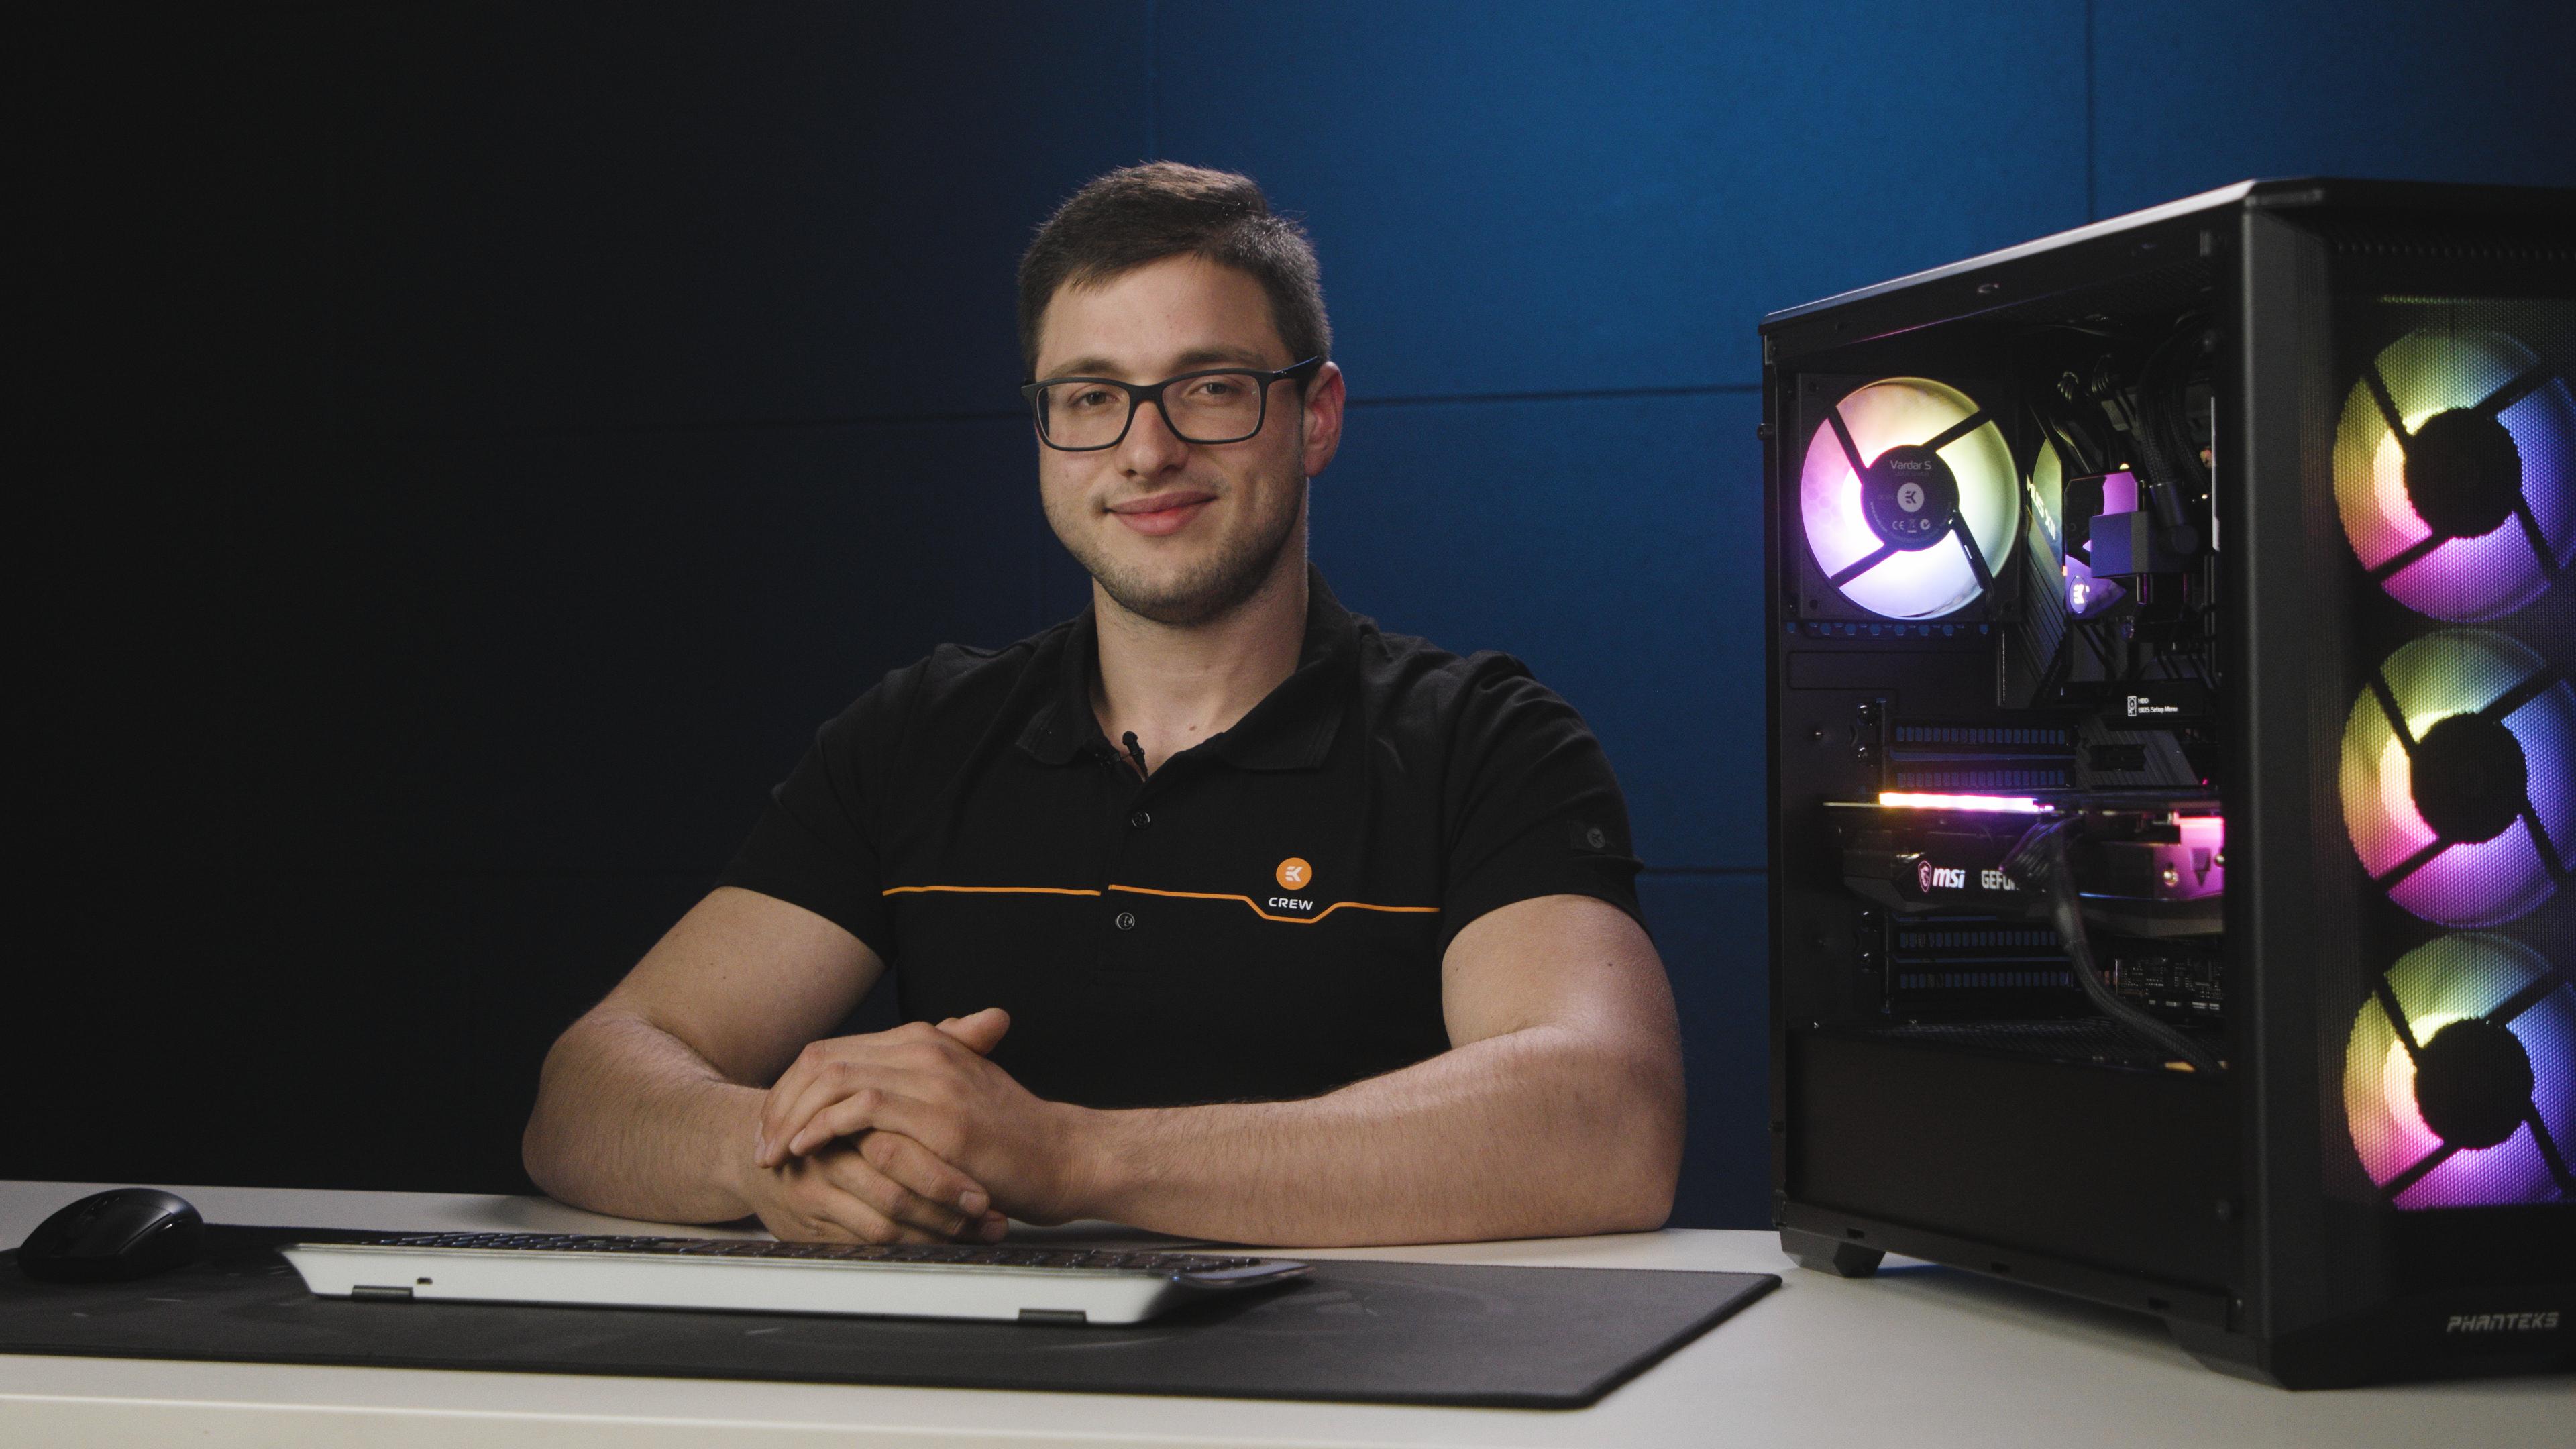 Overclock Your PC with an EK-AIO